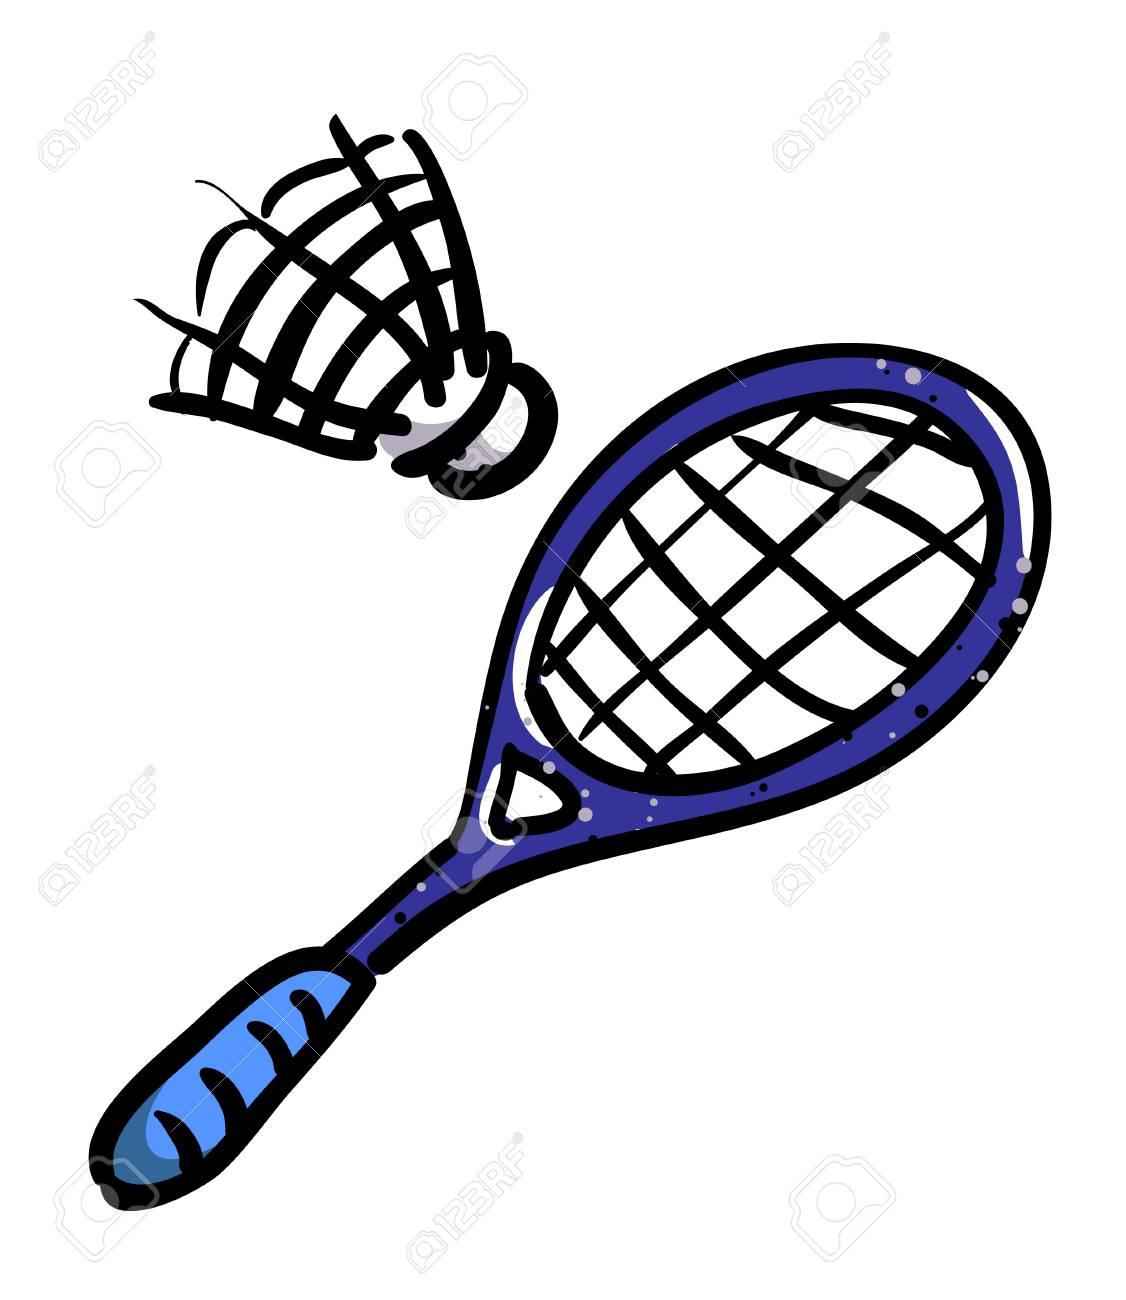 Cartoon Image Of Badminton Icon Sport Symbol Stock Photo Picture